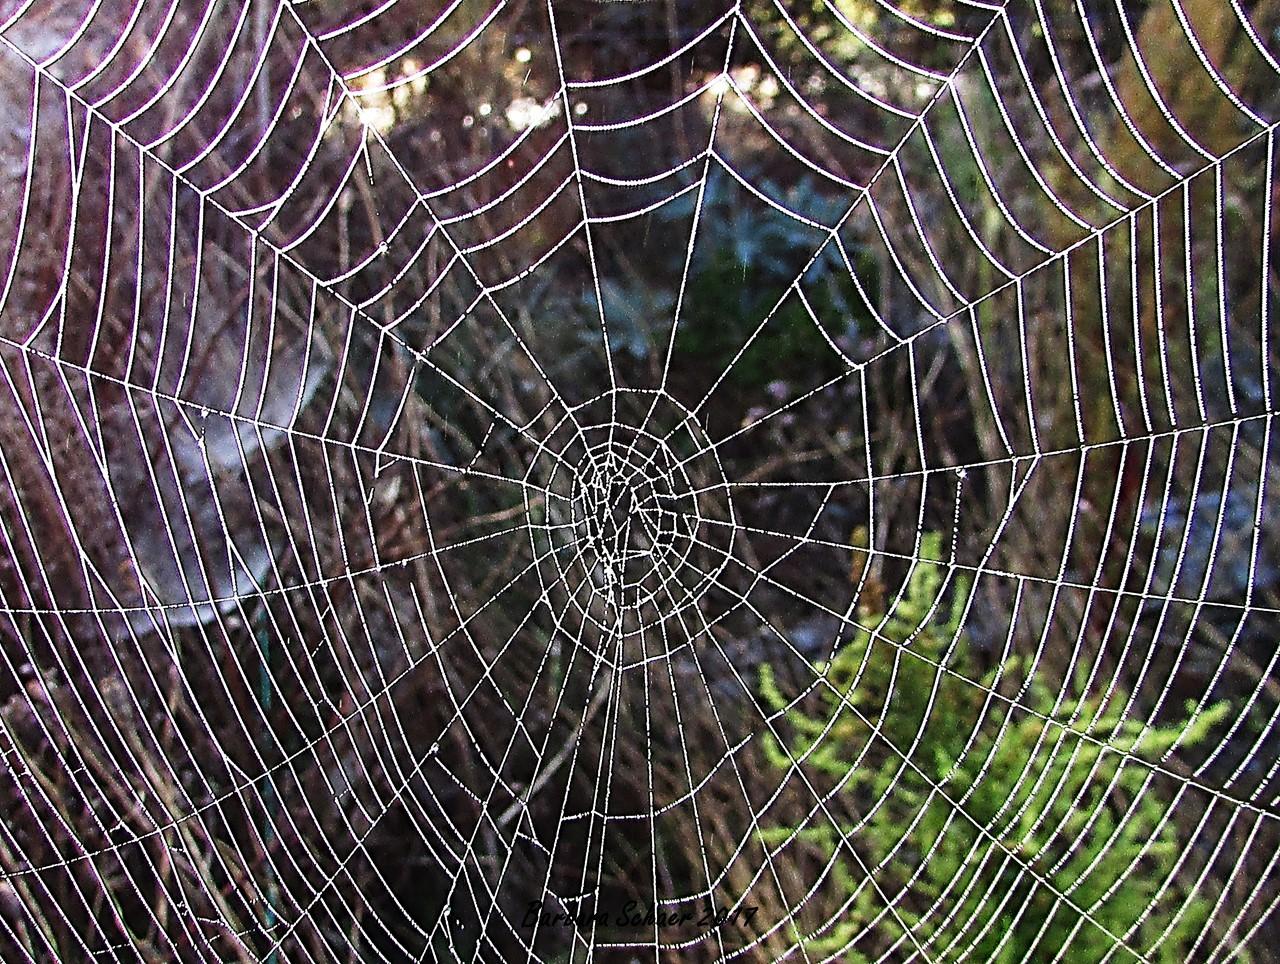 Why Do You Have So Many Cobwebs